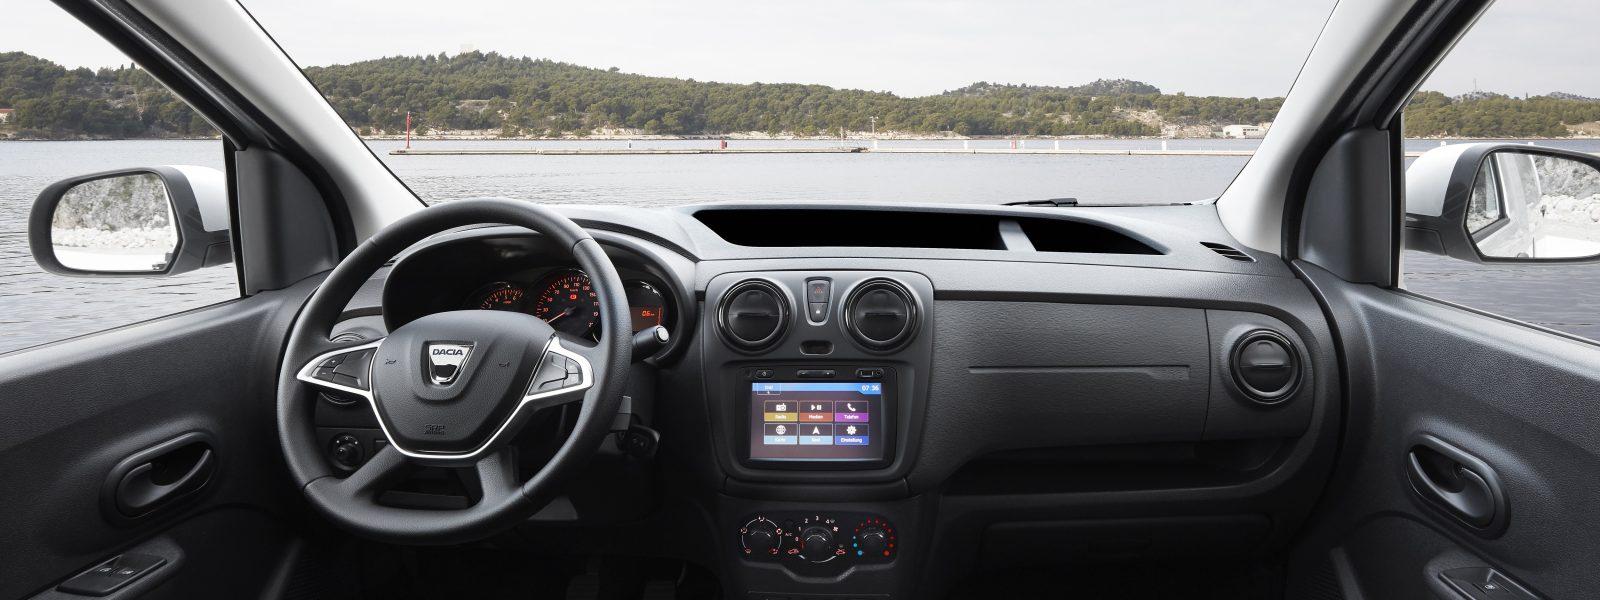 Dacia Dokker - Sondrup Bilcenter (5)